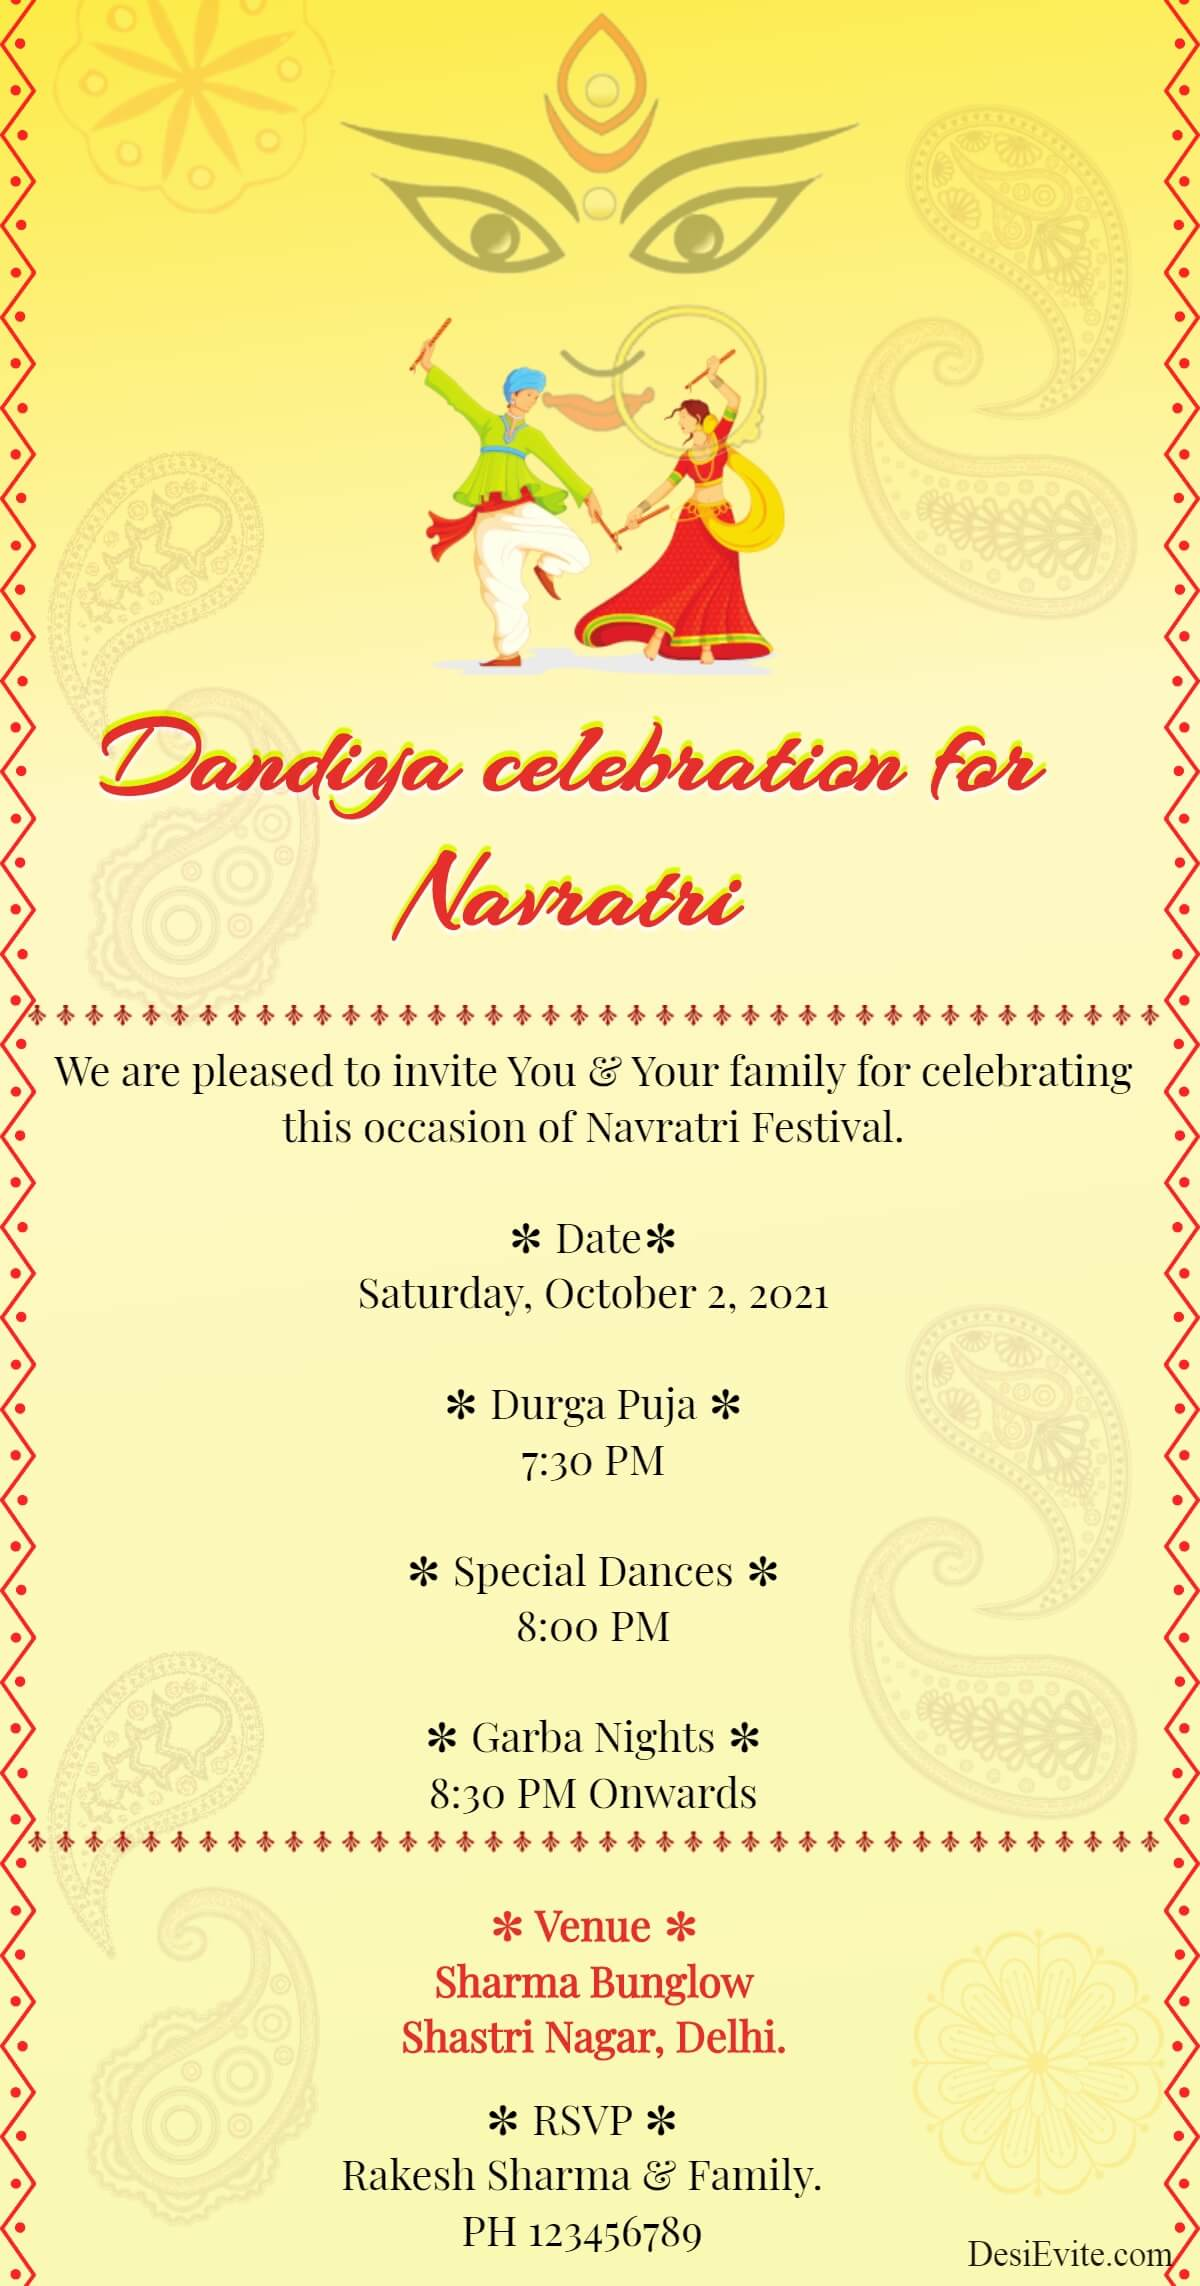 Dandiya celebration for Navratri Invitation 149 85